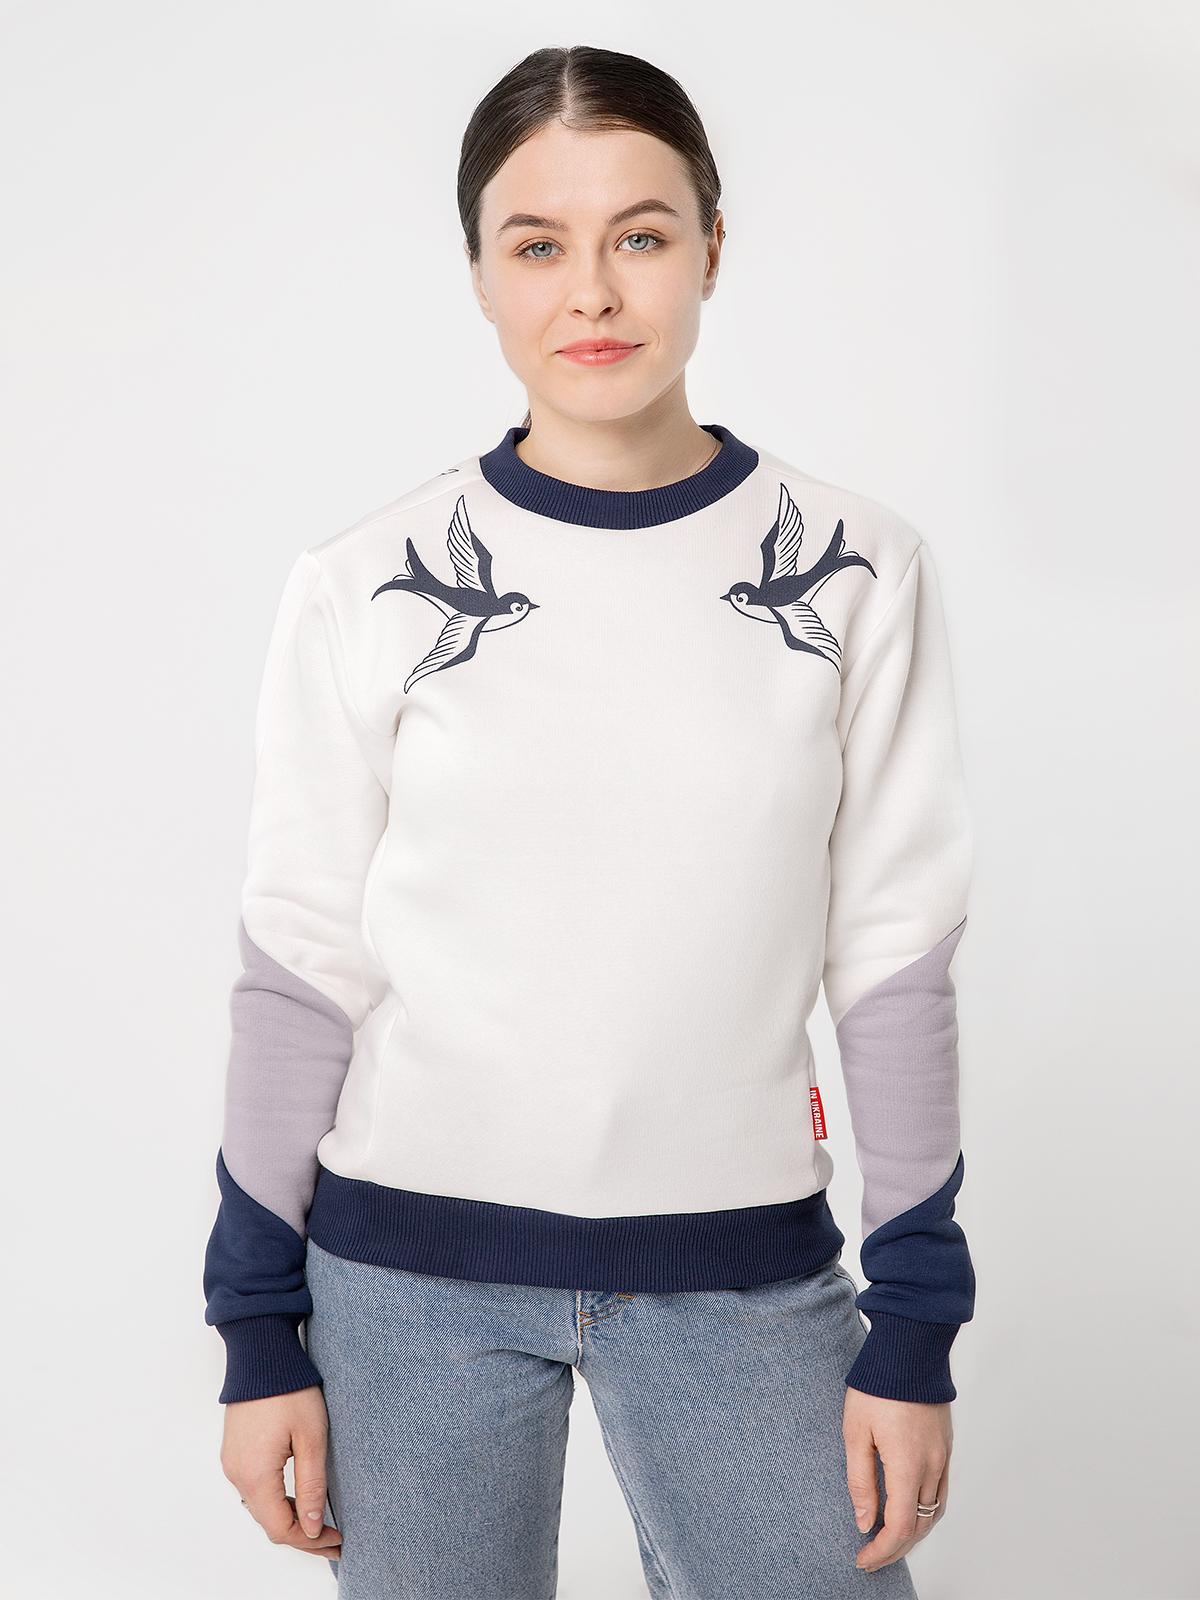 Women's Sweatshirt Swallow. Color white. Three-cord thread fabric: 77% cotton, 23% polyester.